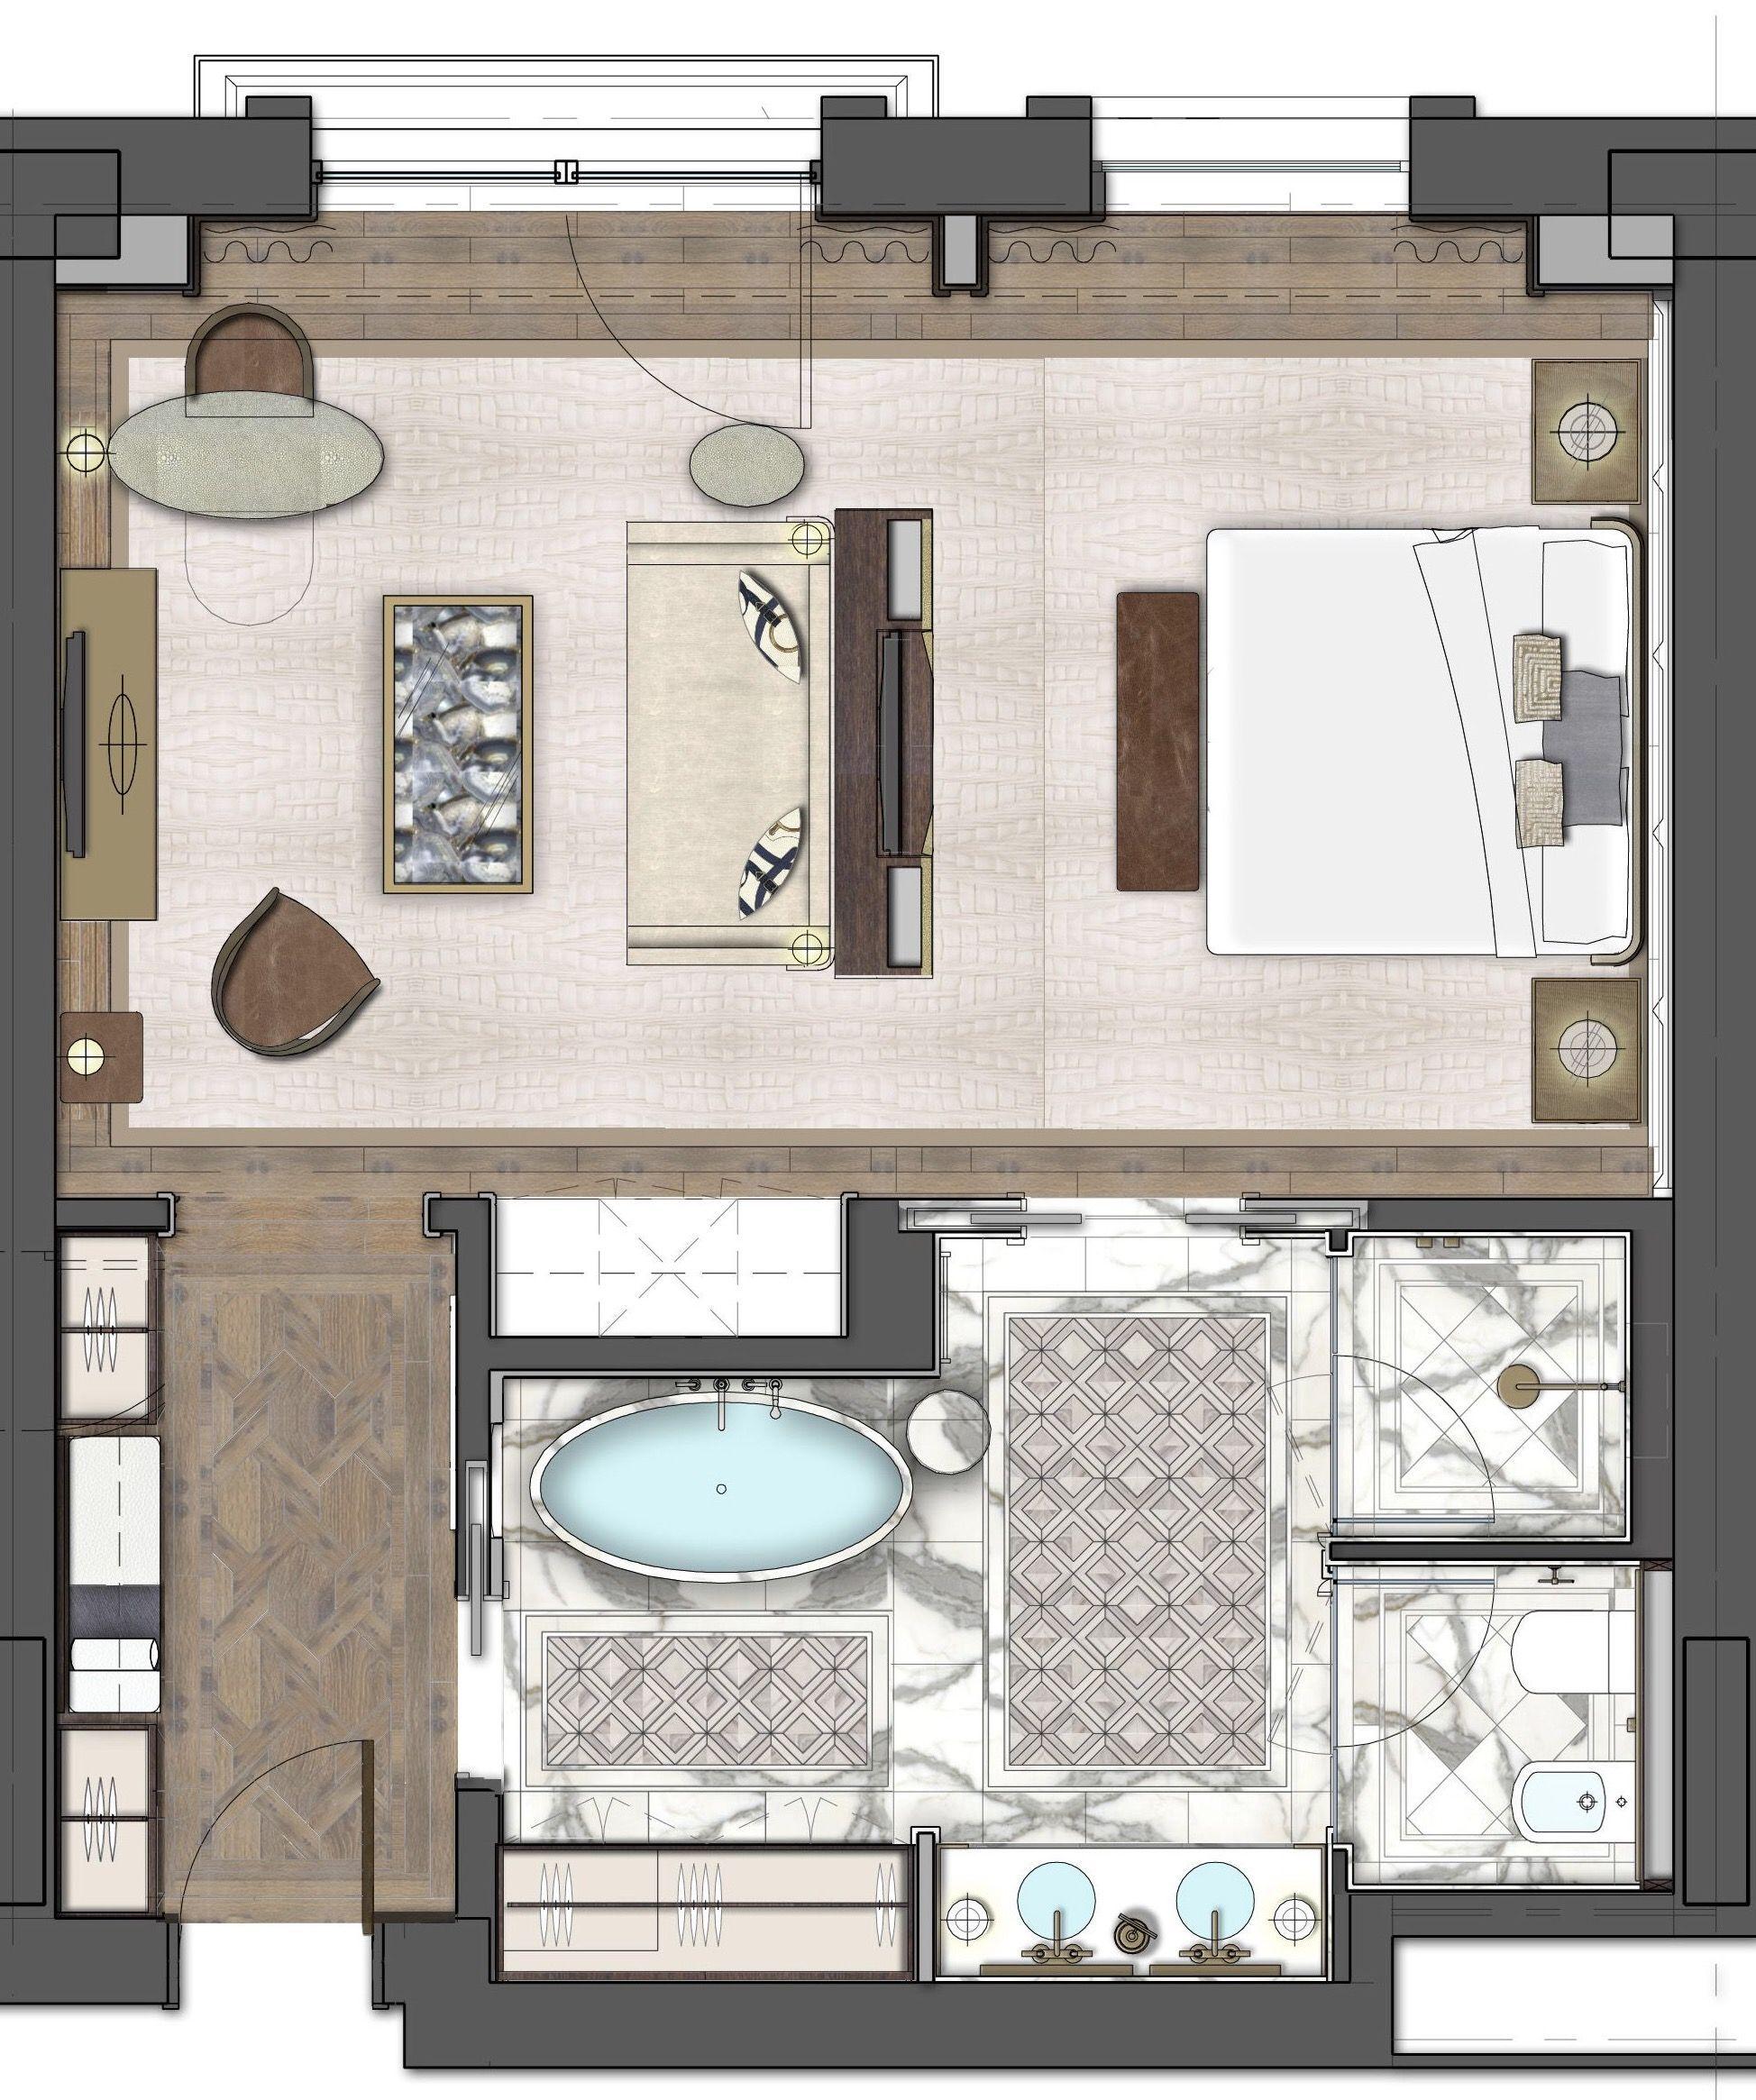 The St Regis Astana Deluxe Room 68sqm In 2020 Hotel Room Design Plan Hotel Room Design Bedrooms Hotel Room Design